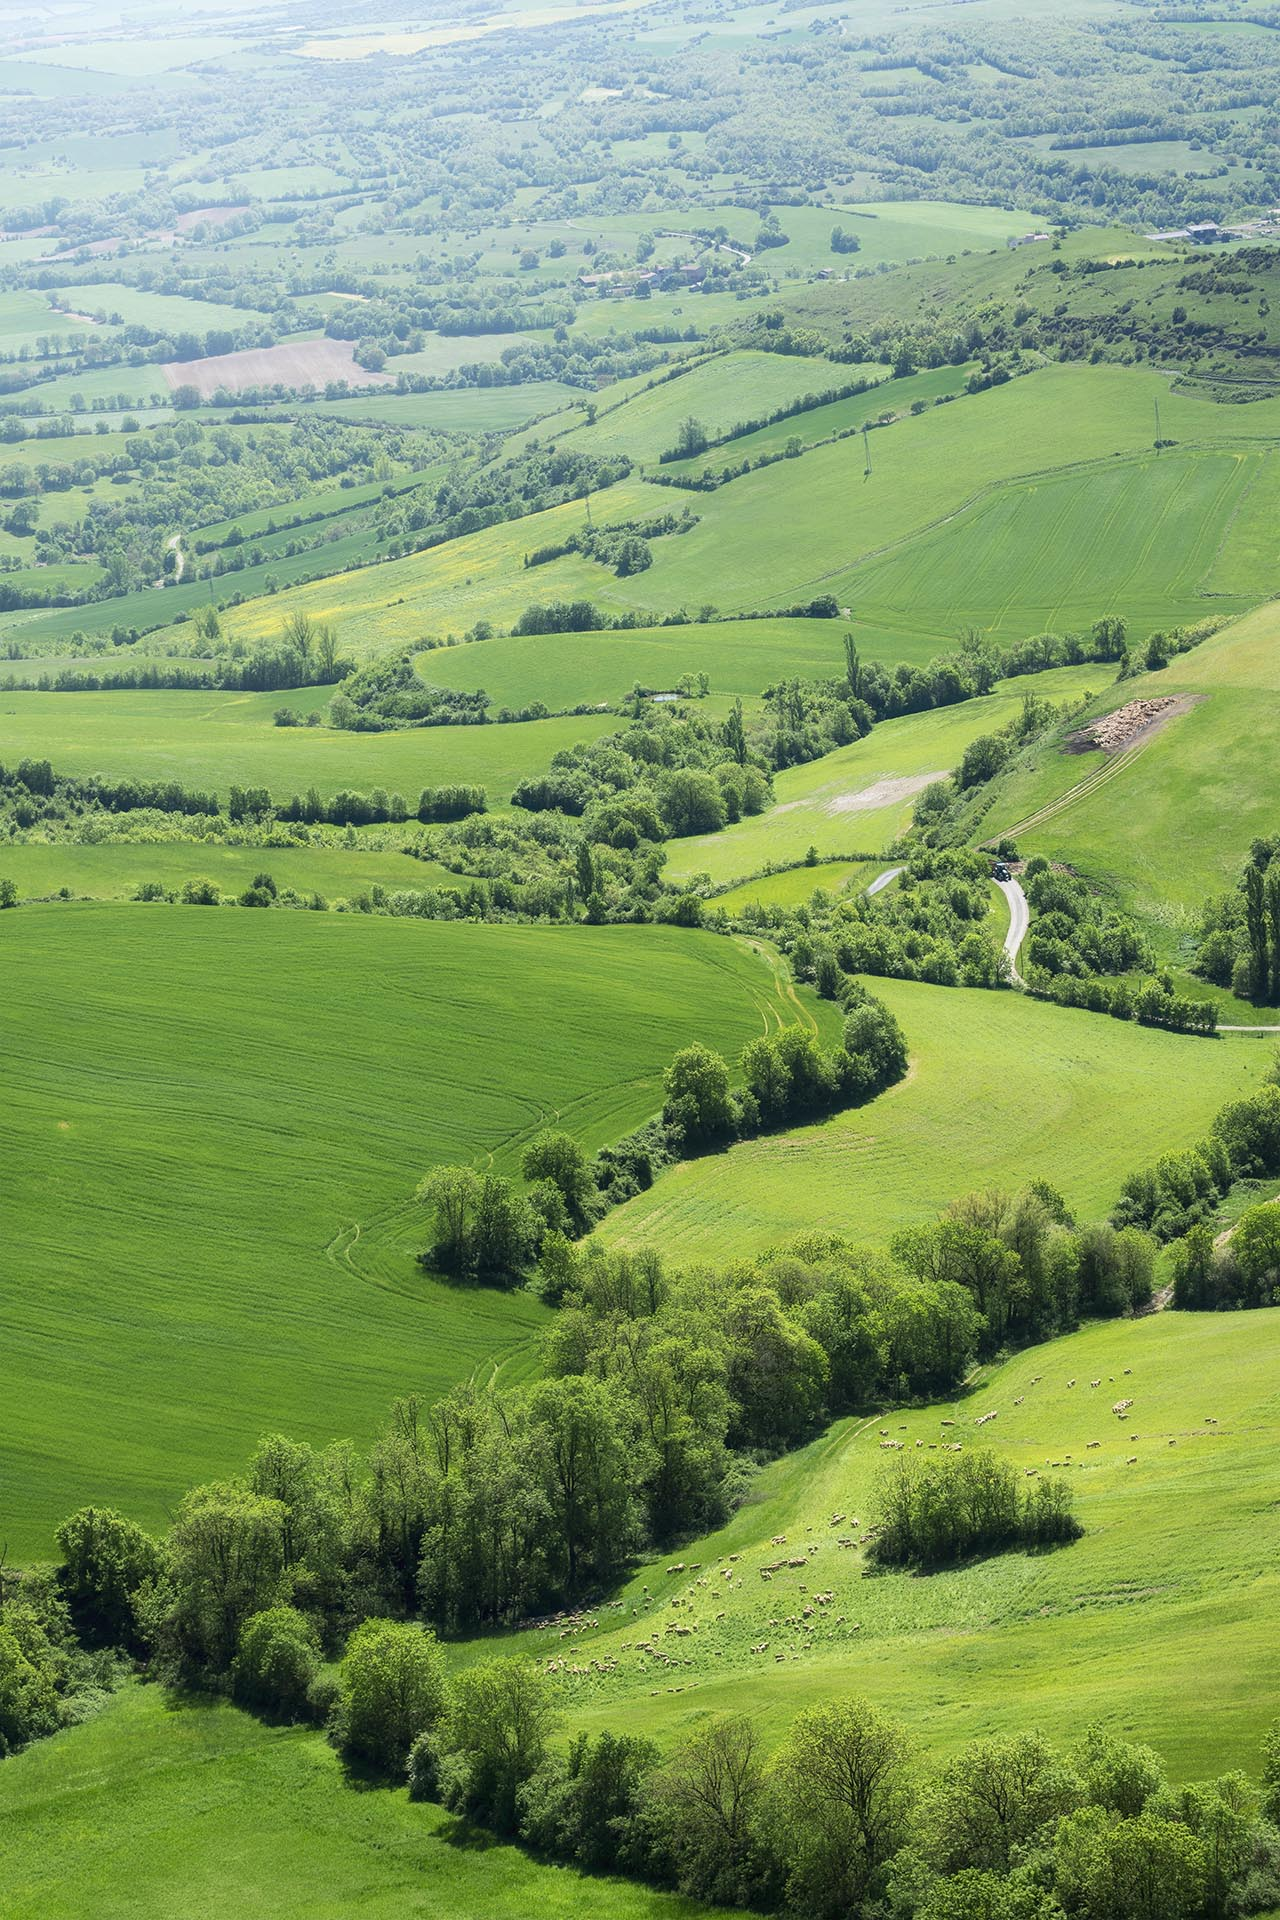 Frankrijk (Aveyron)